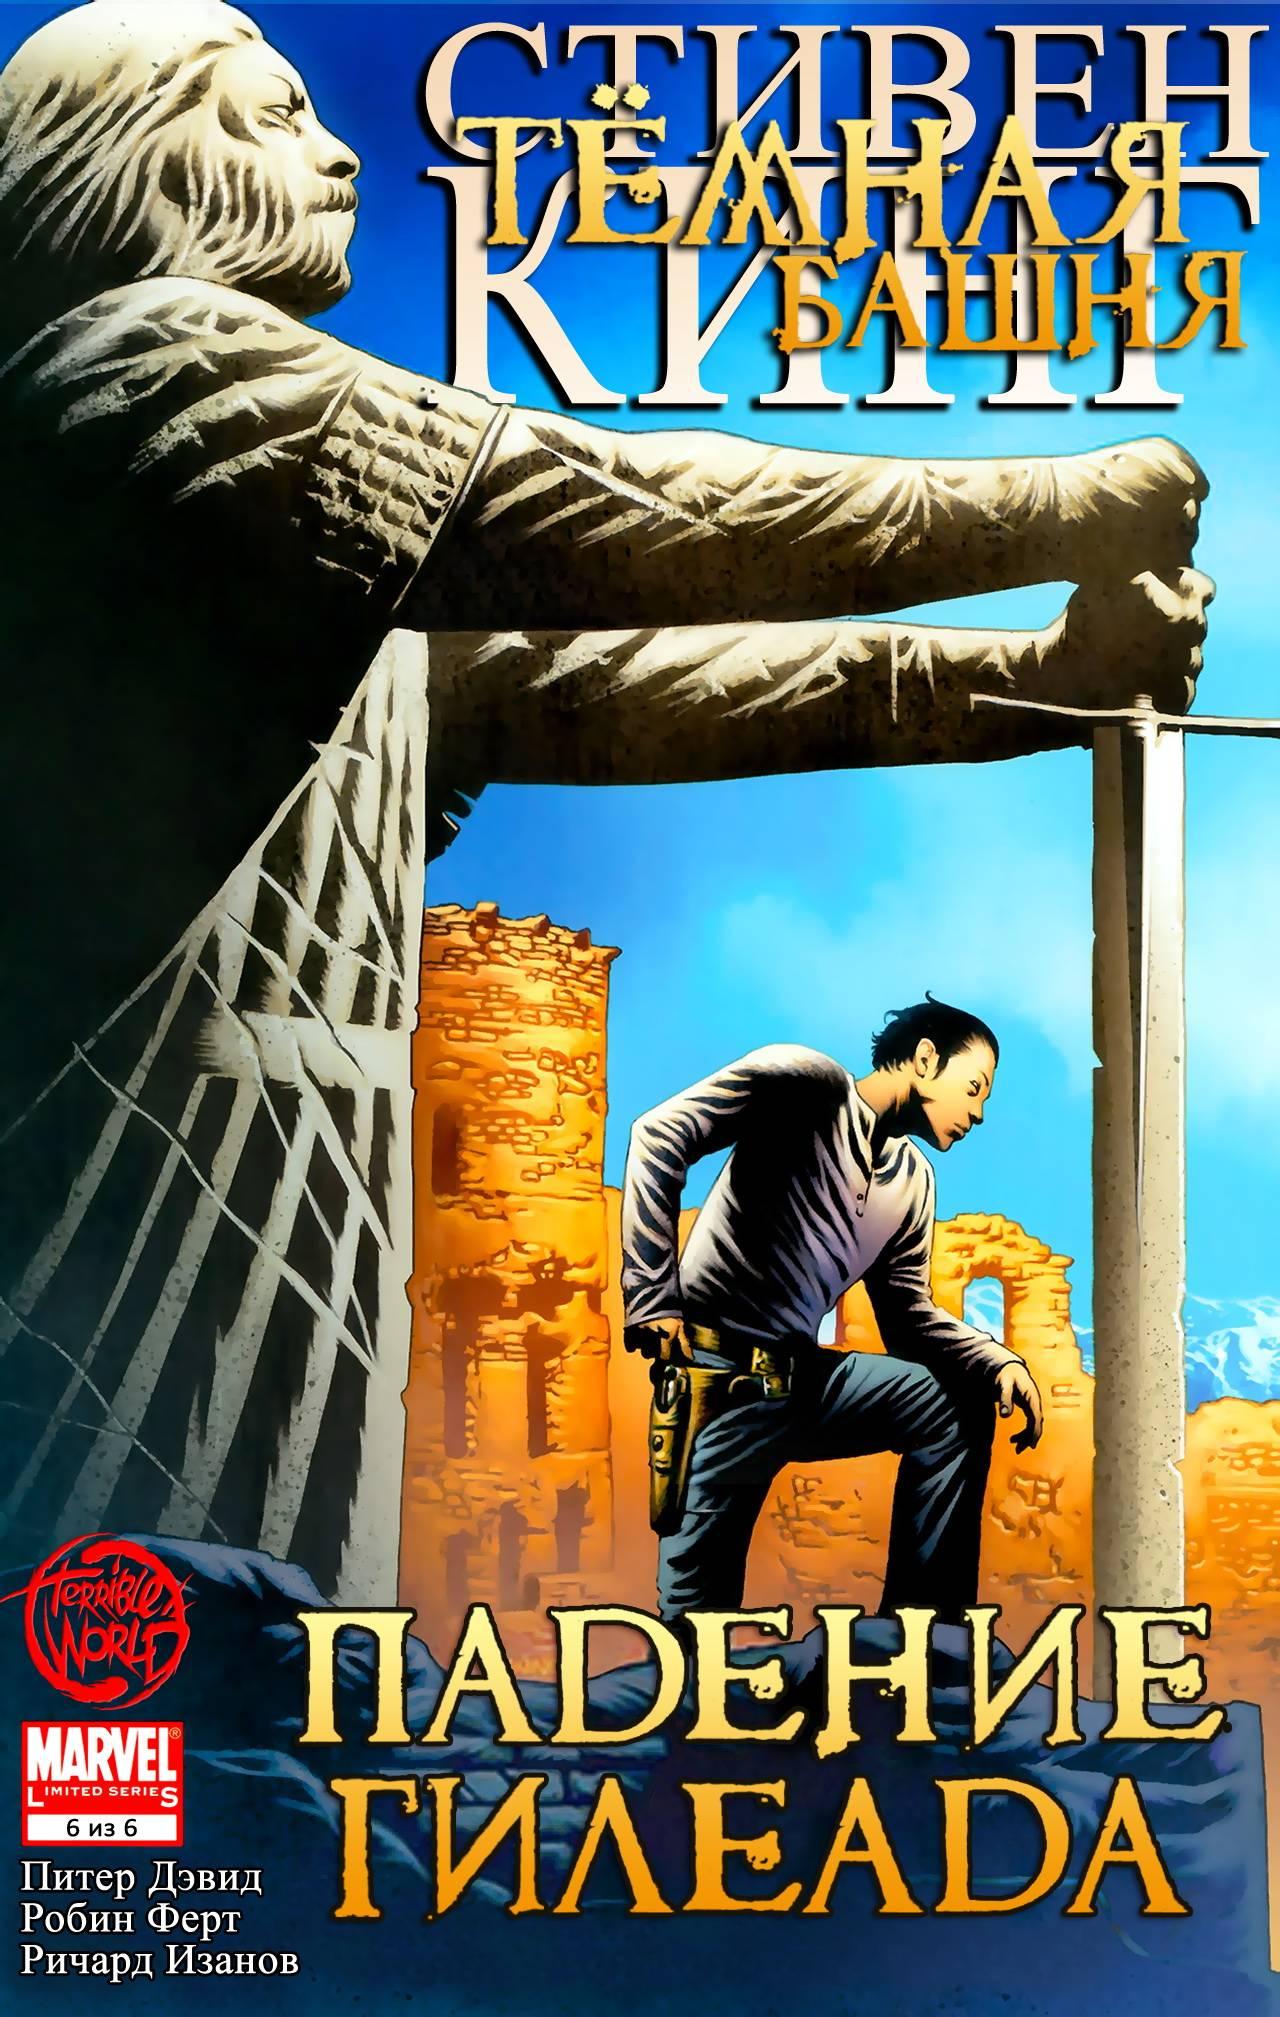 Тёмная Башня: Падение Гилеада №6 онлайн